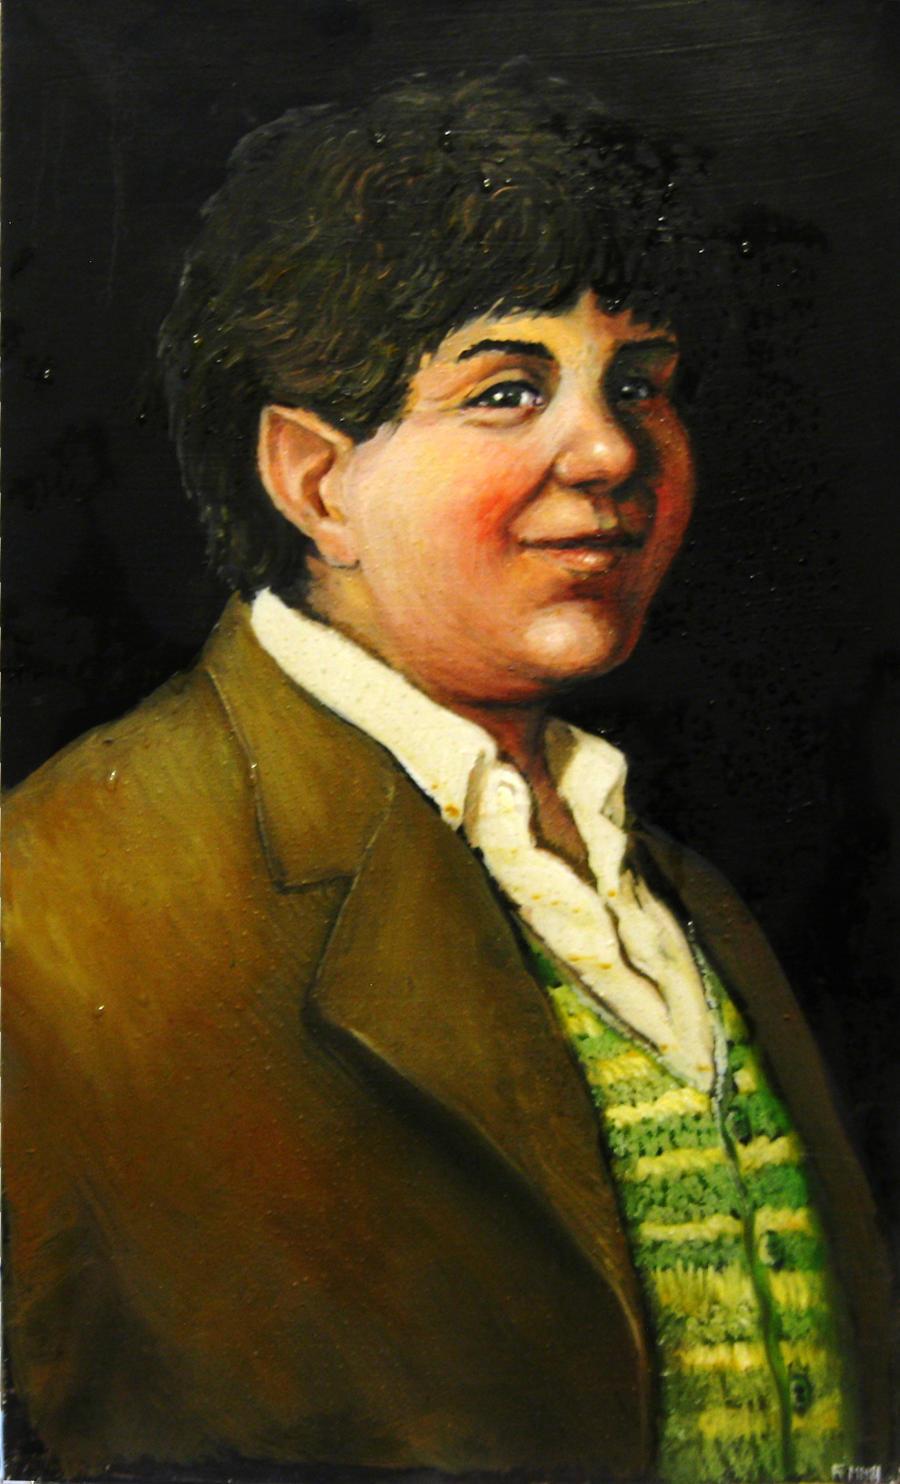 TolmanCotton's Profile Picture